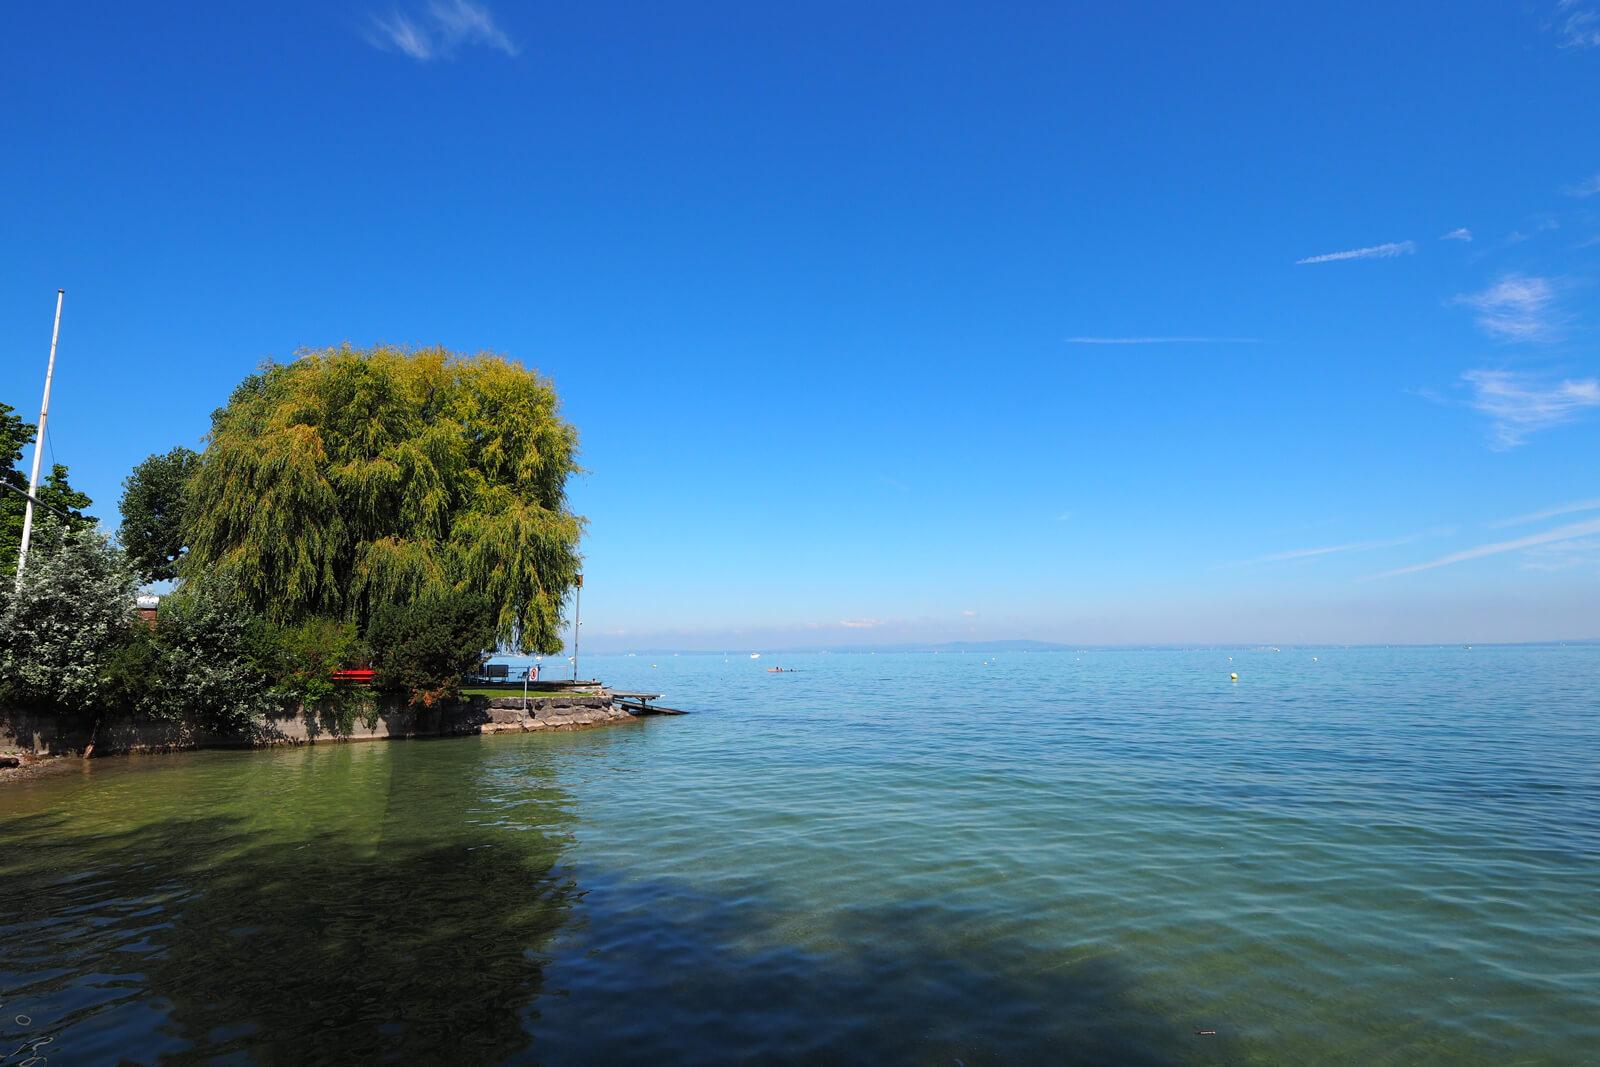 Arbon Lakeside - Summer 2020